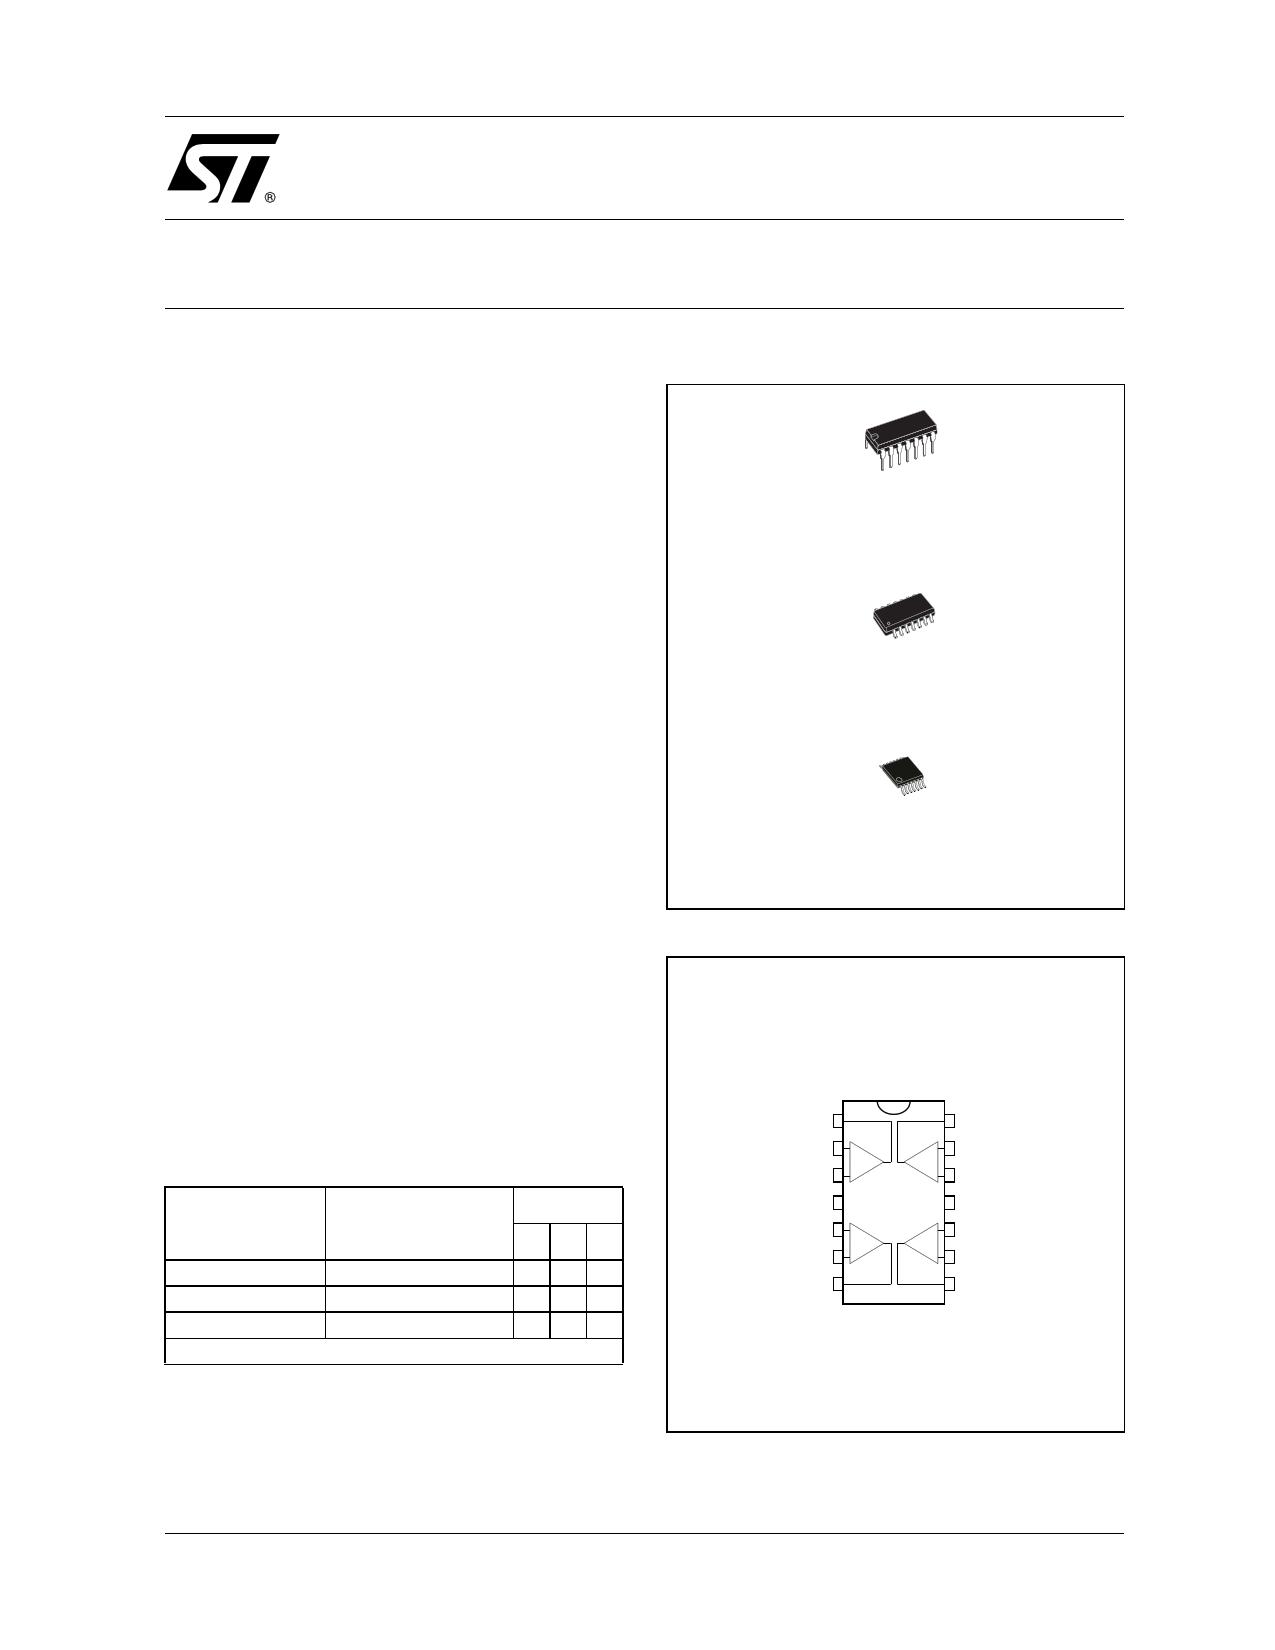 TS27M4BI Datasheet, TS27M4BI PDF,ピン配置, 機能